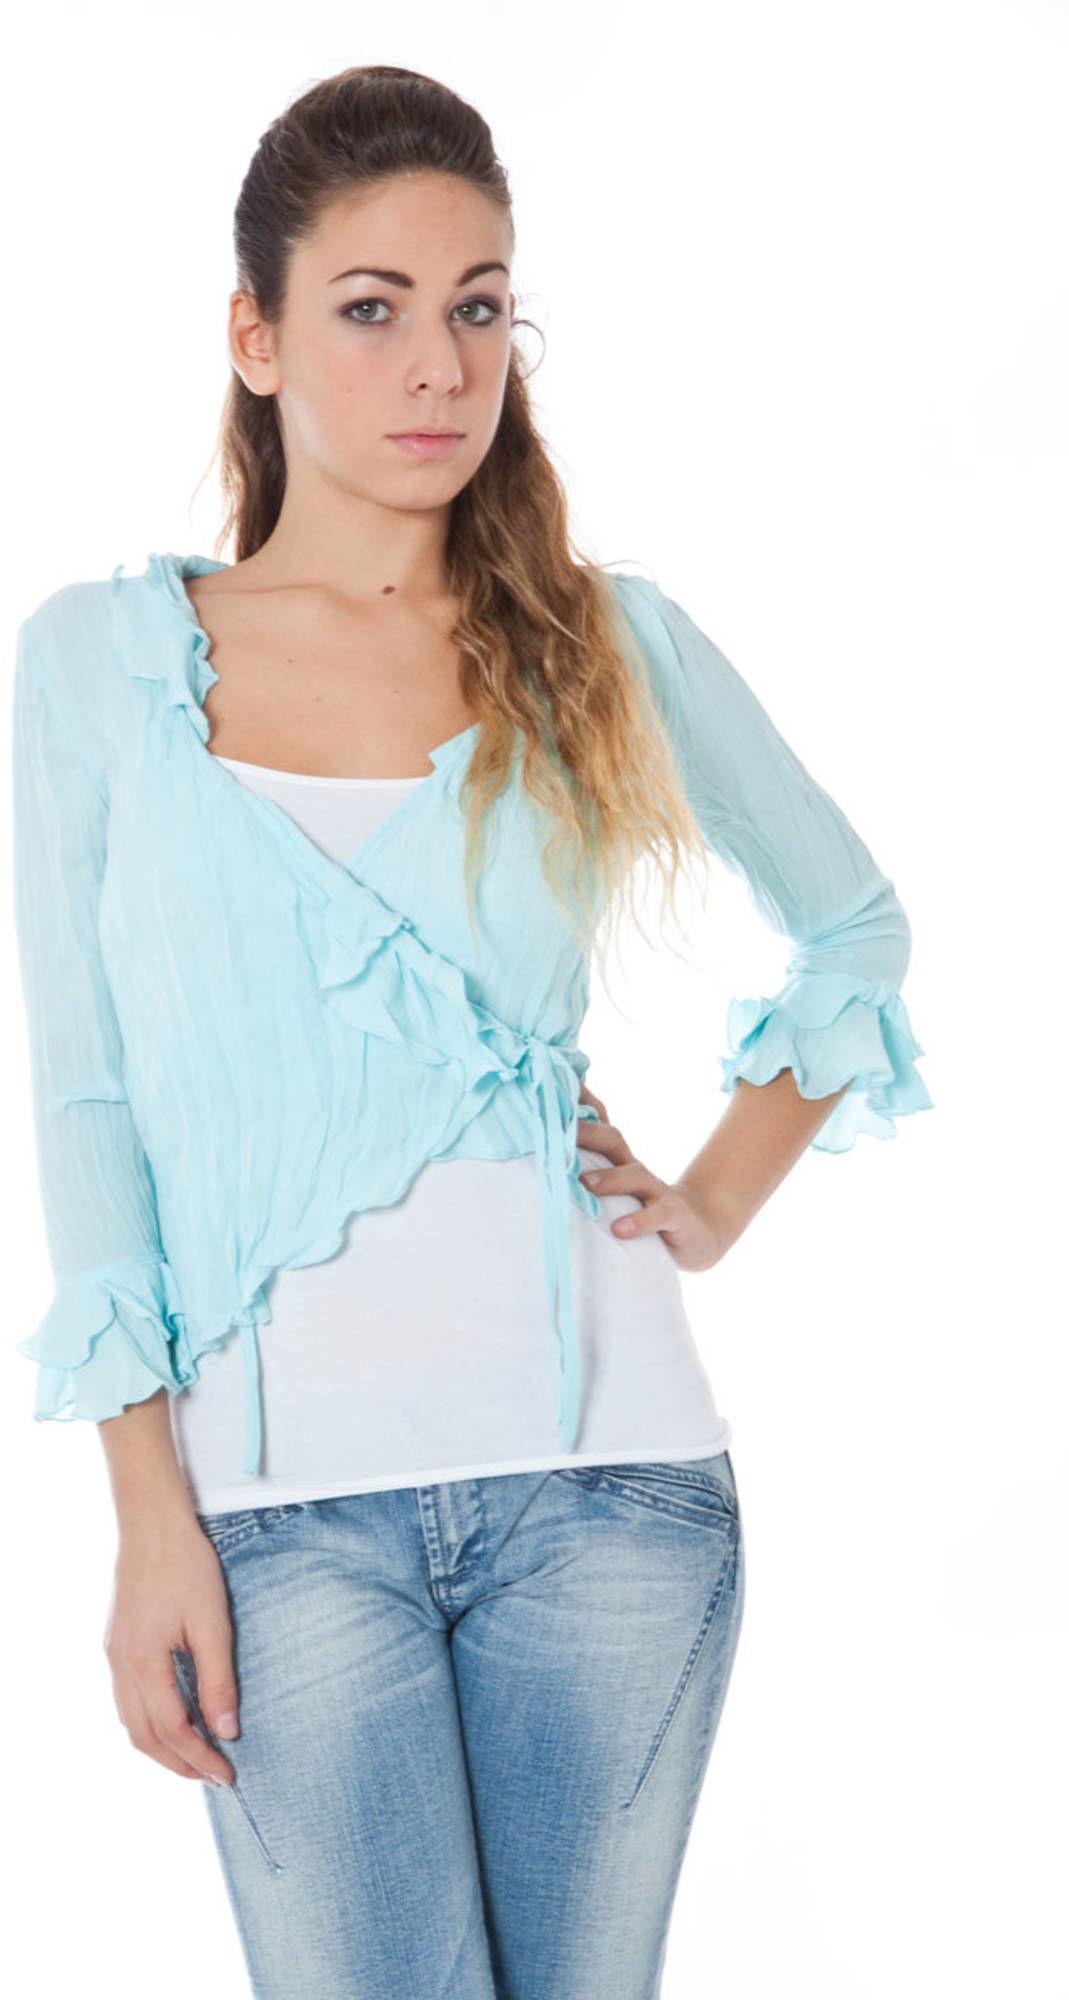 PHARD Shirt long sleeves Women